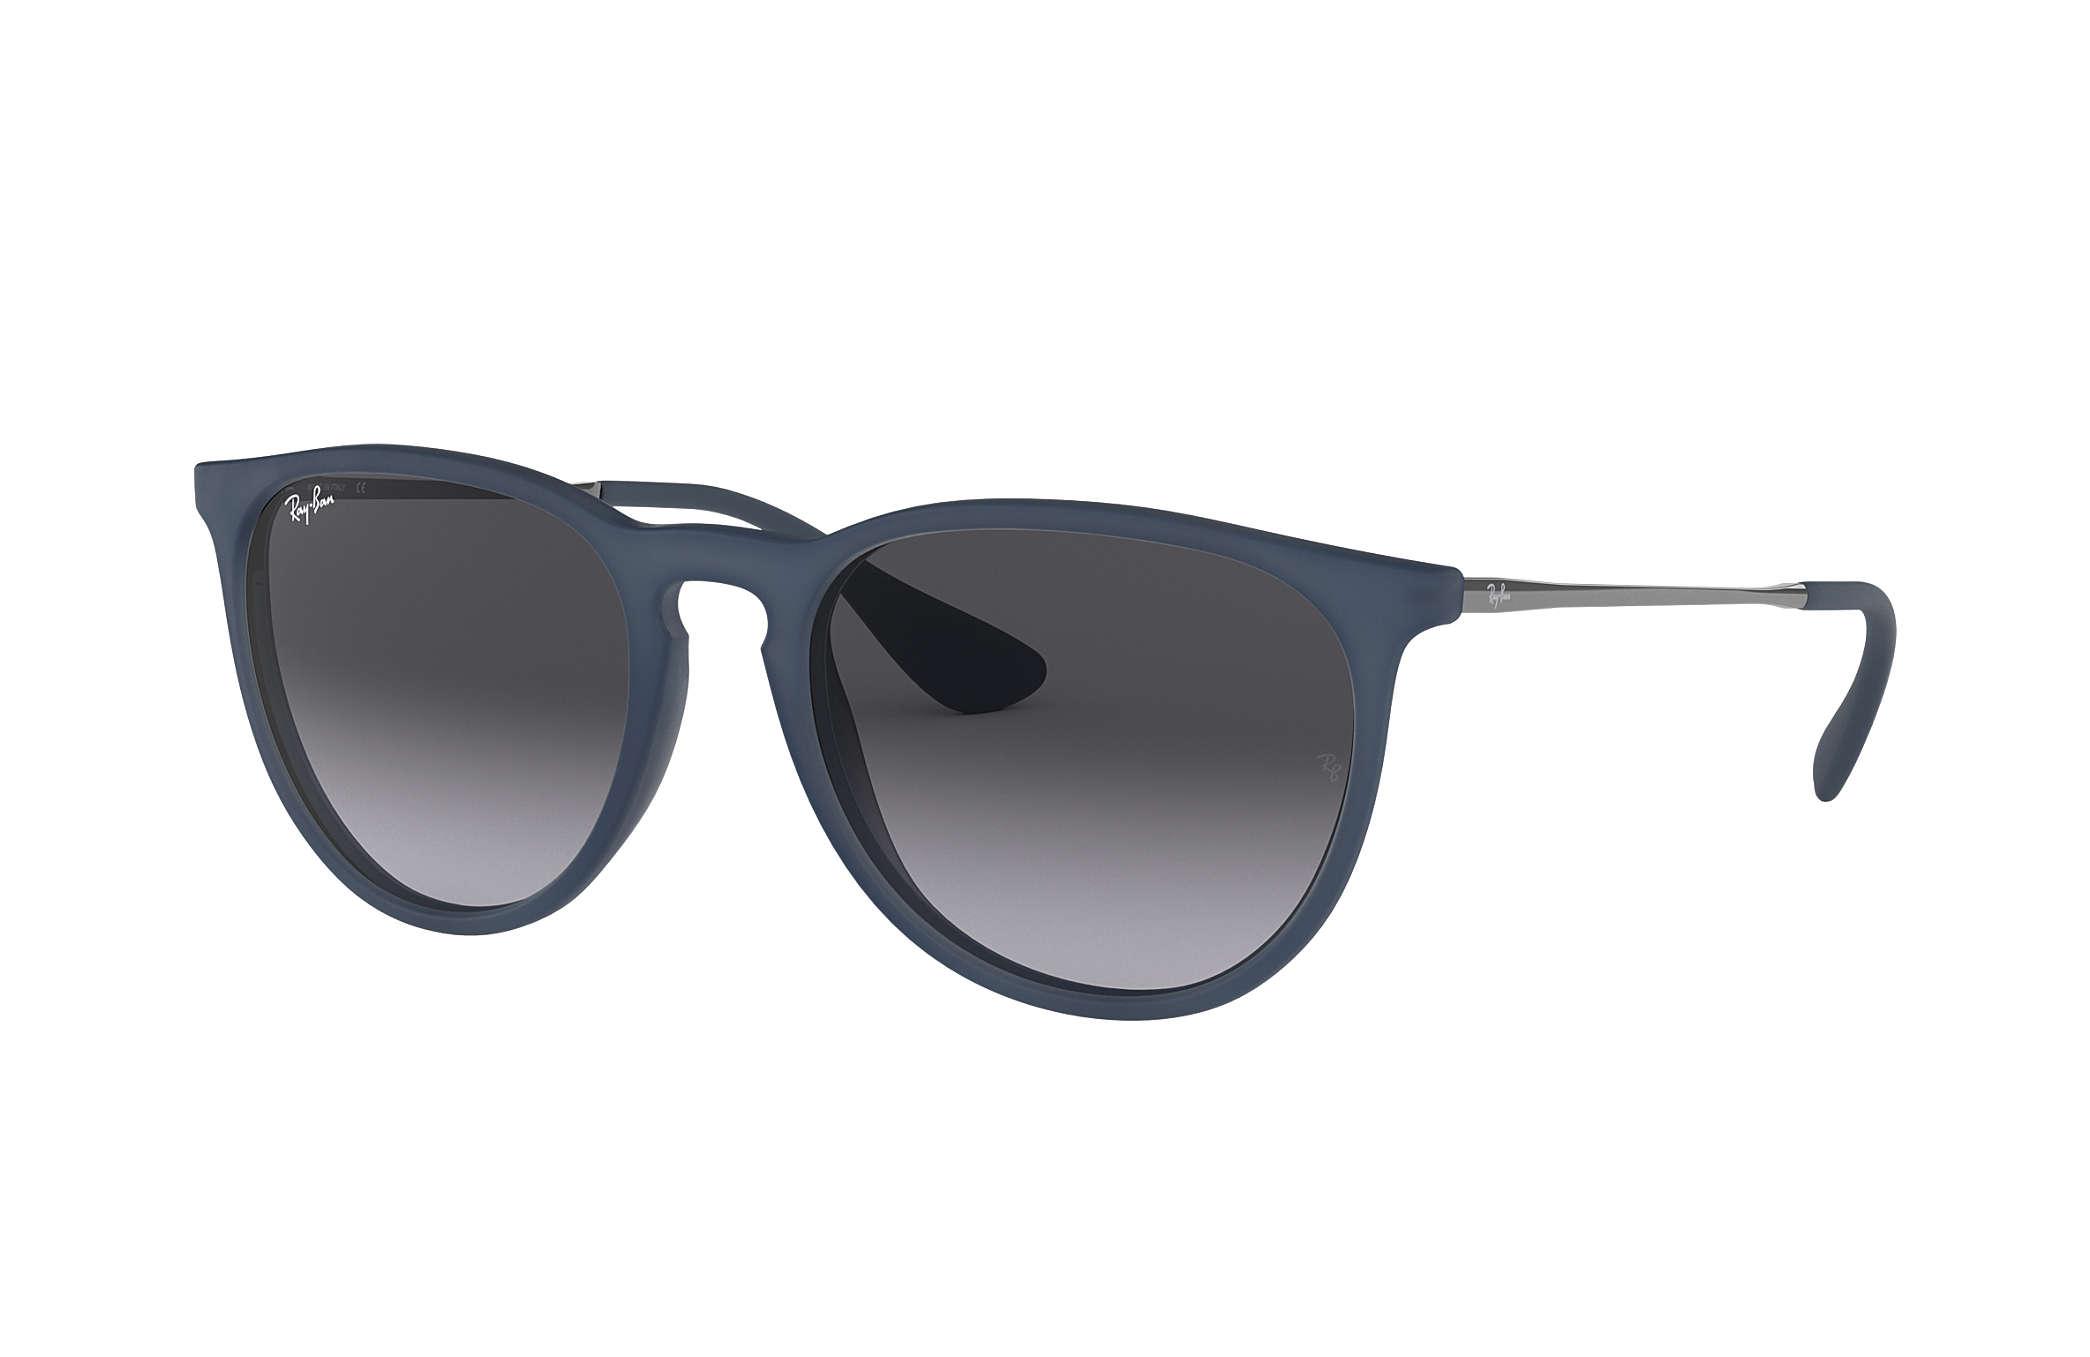 ray ban sonnenbrille erika braun